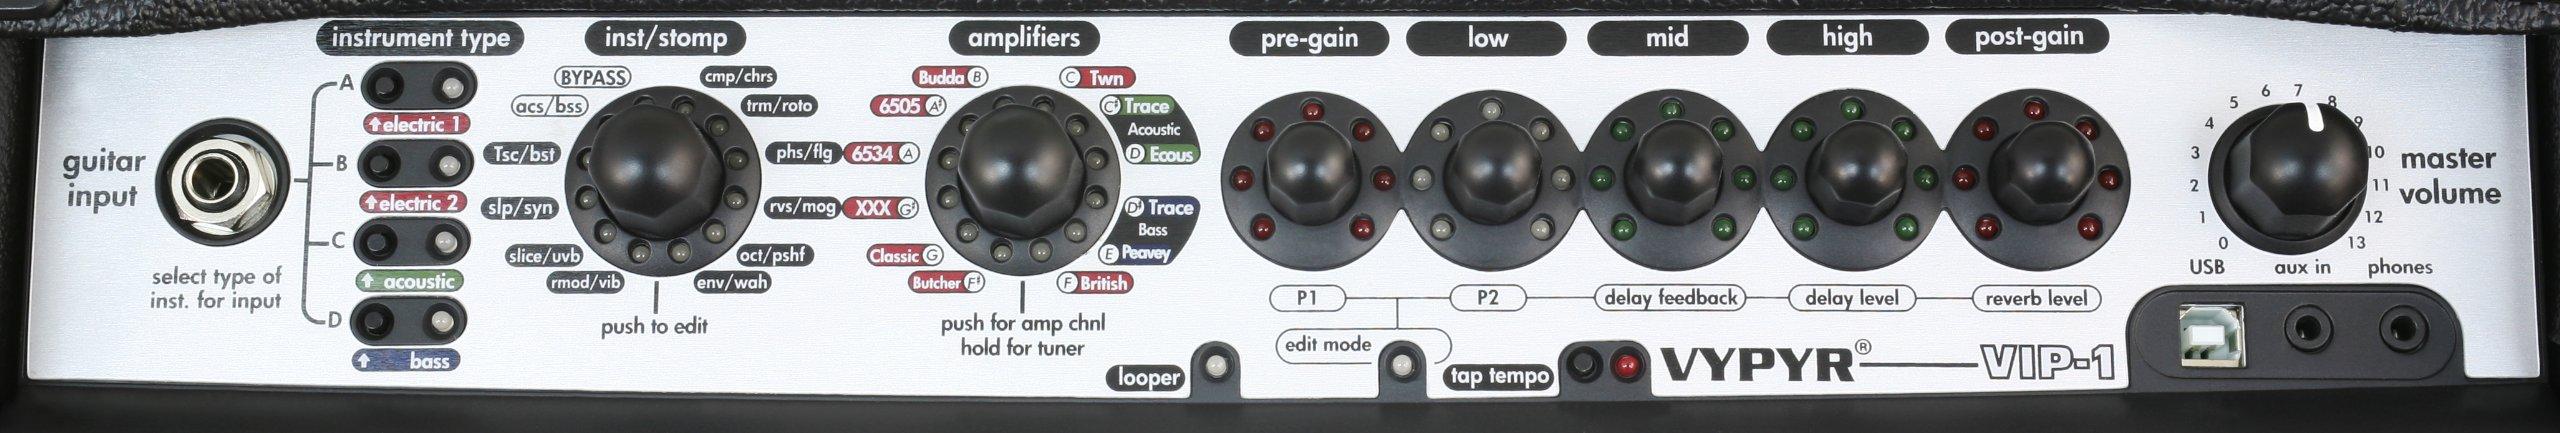 Peavey Vypyr VIP 1 - 20 Watt Modeling Instrument Amplifier by Peavey